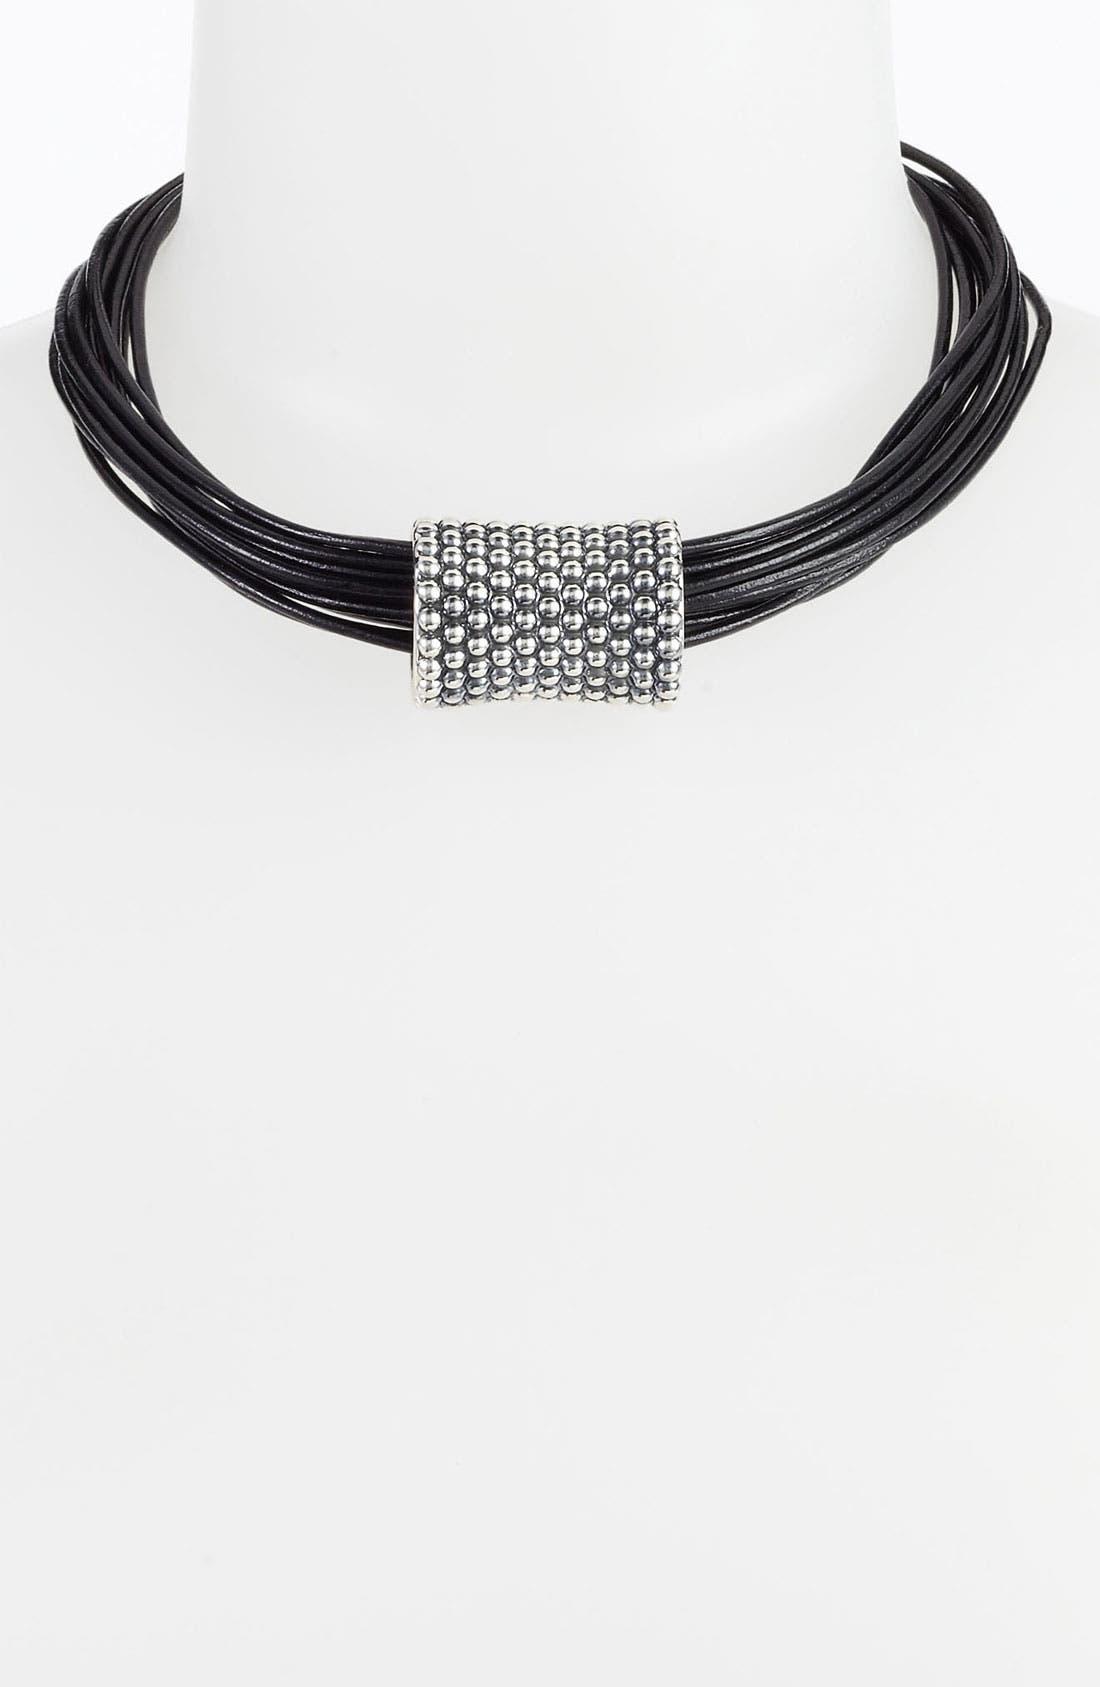 Alternate Image 1 Selected - Simon Sebbag 'Prosecco' Multistrand Leather Necklace